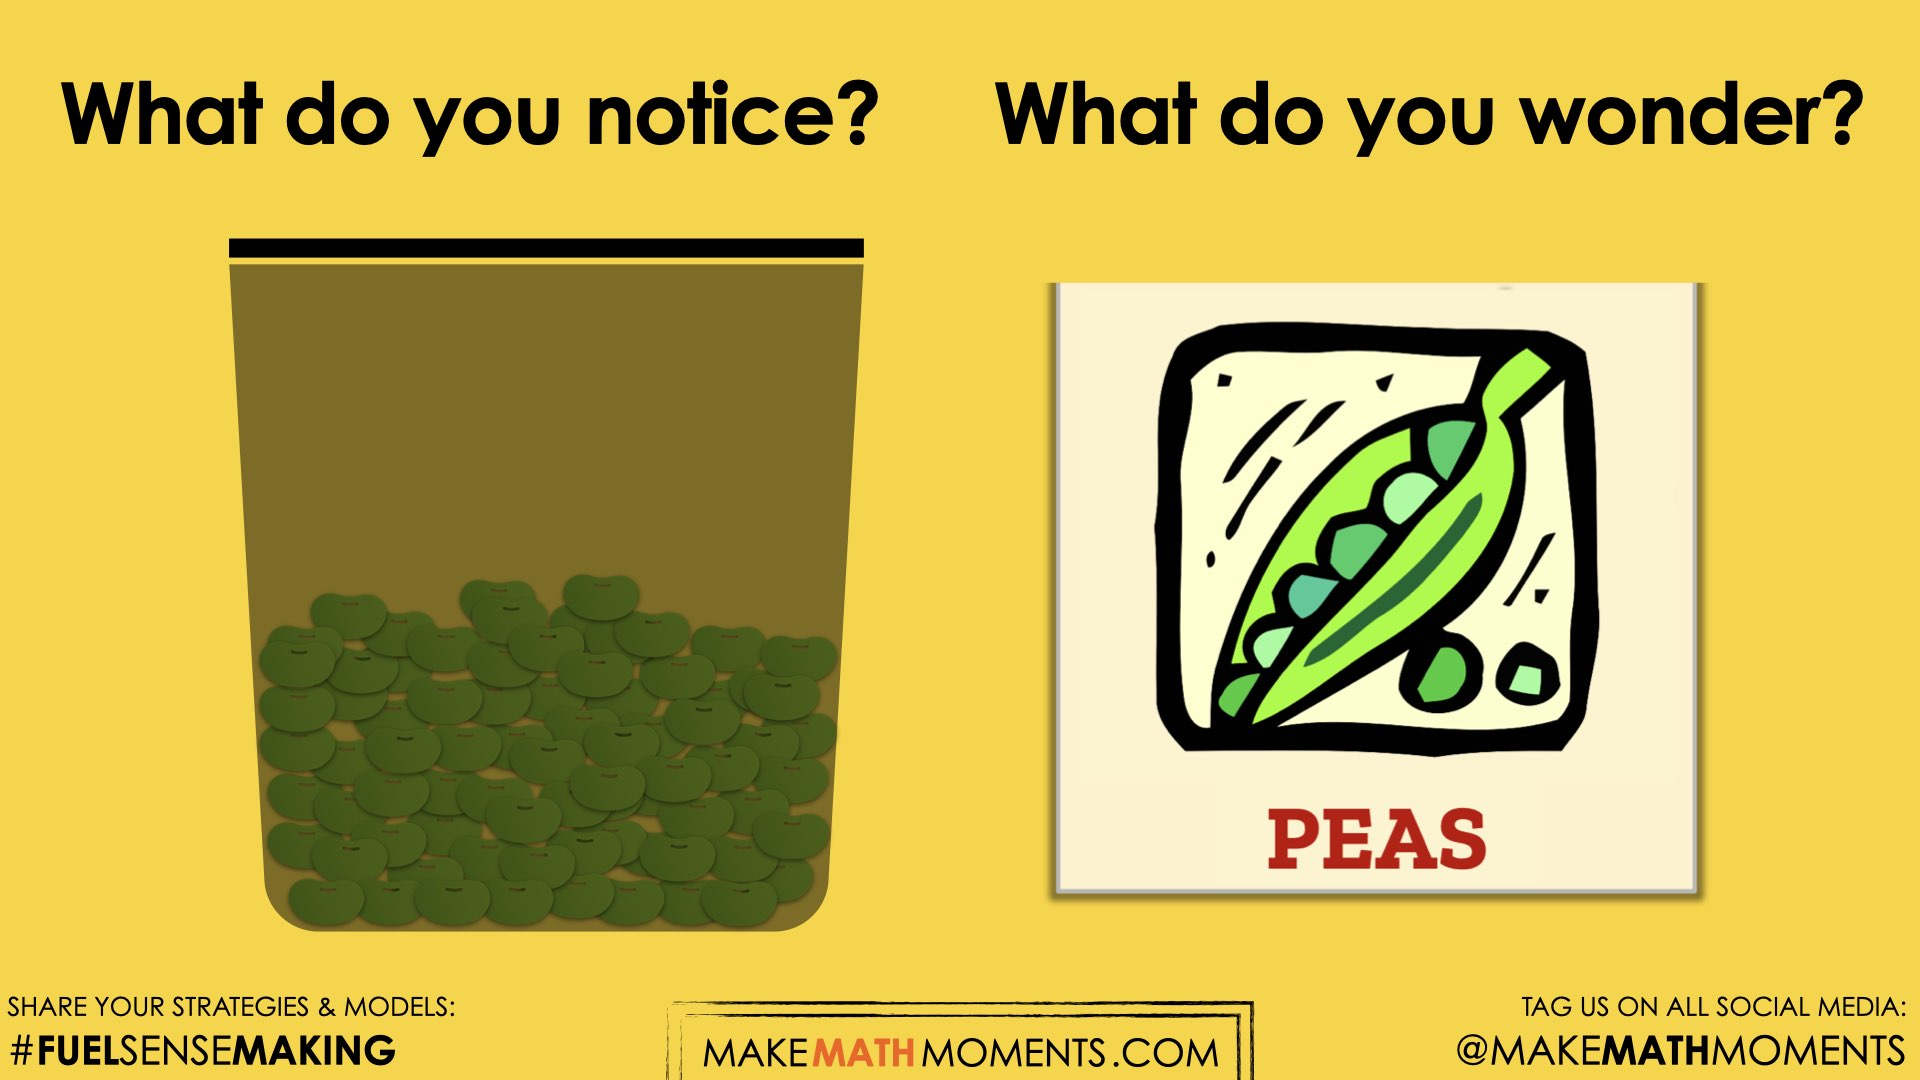 Sowing Seeds [Day 1] - Planting Peas - 02 - SPARK IMAGE - Notice Wonder.001